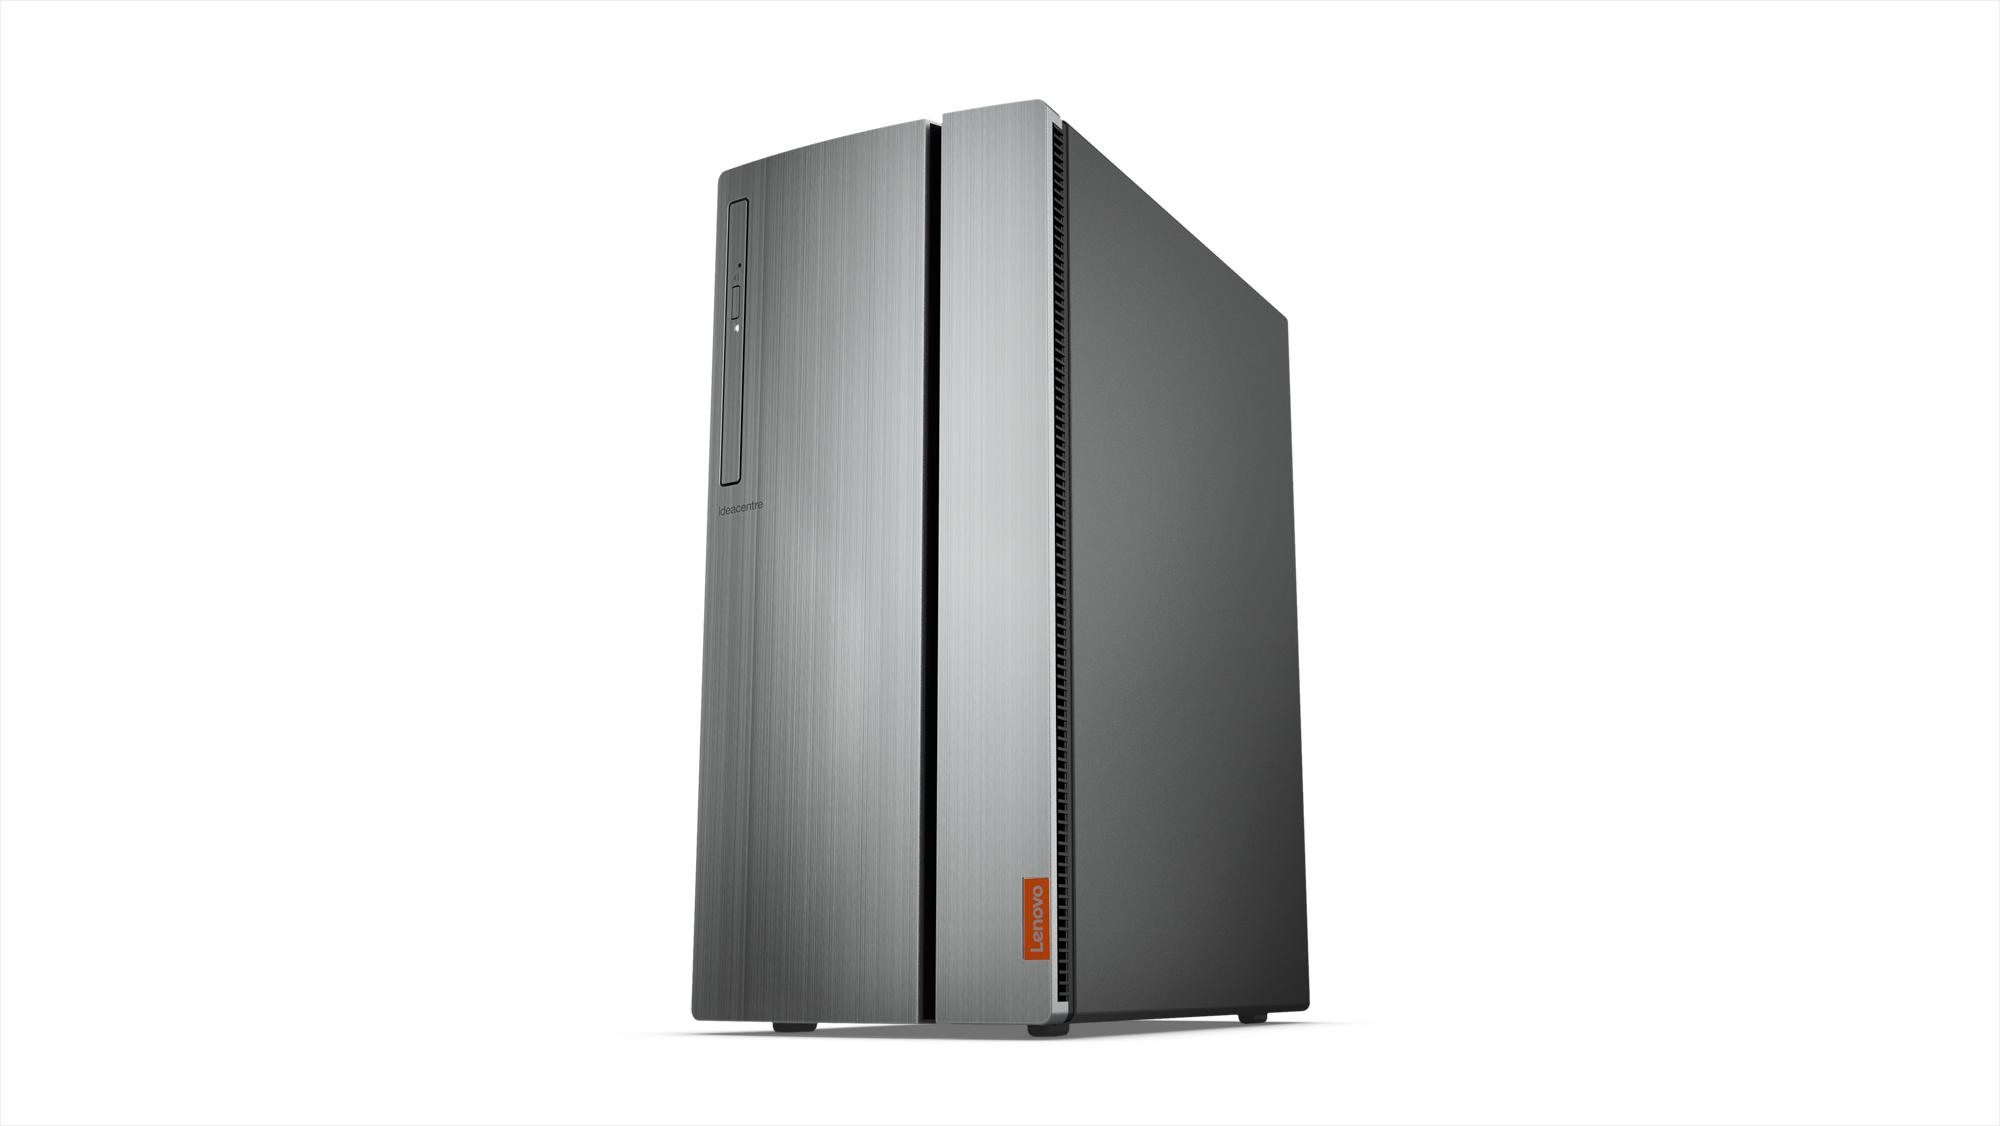 Electronicshop24 Notebooks Computer Tvs Und Vieles Mehr Zu Top Lenovo Ideacentre Aio 510 22ish Core I5 7100t 4gb Ddr4 1tb Hd White 720 18asu Amd Ryzen 5 8gb Rx 560